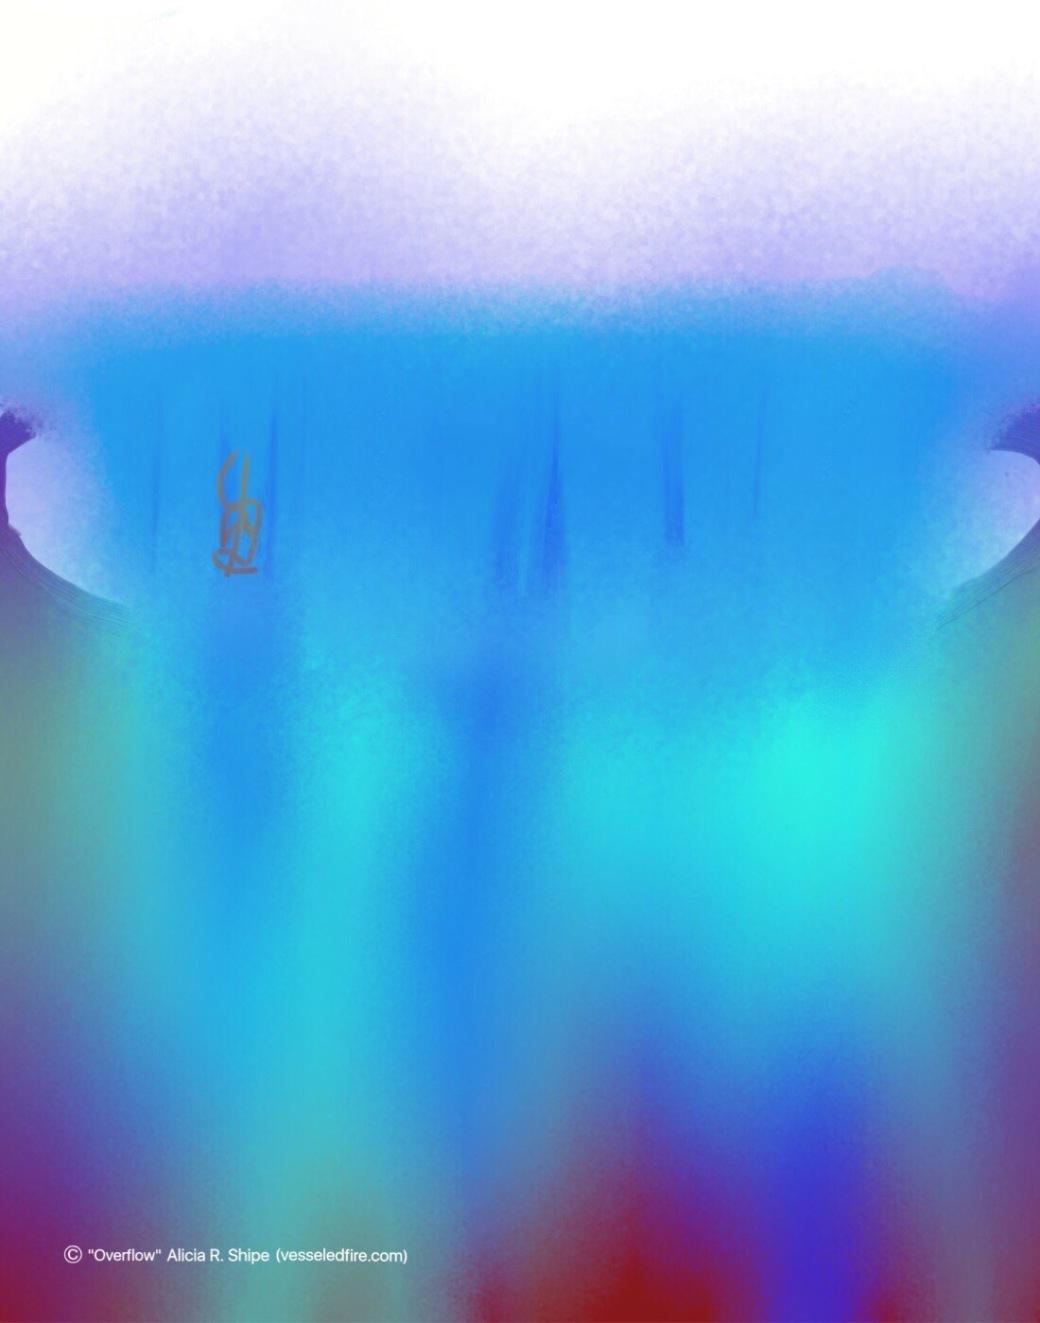 Overflow Digital: 11x14: ARS